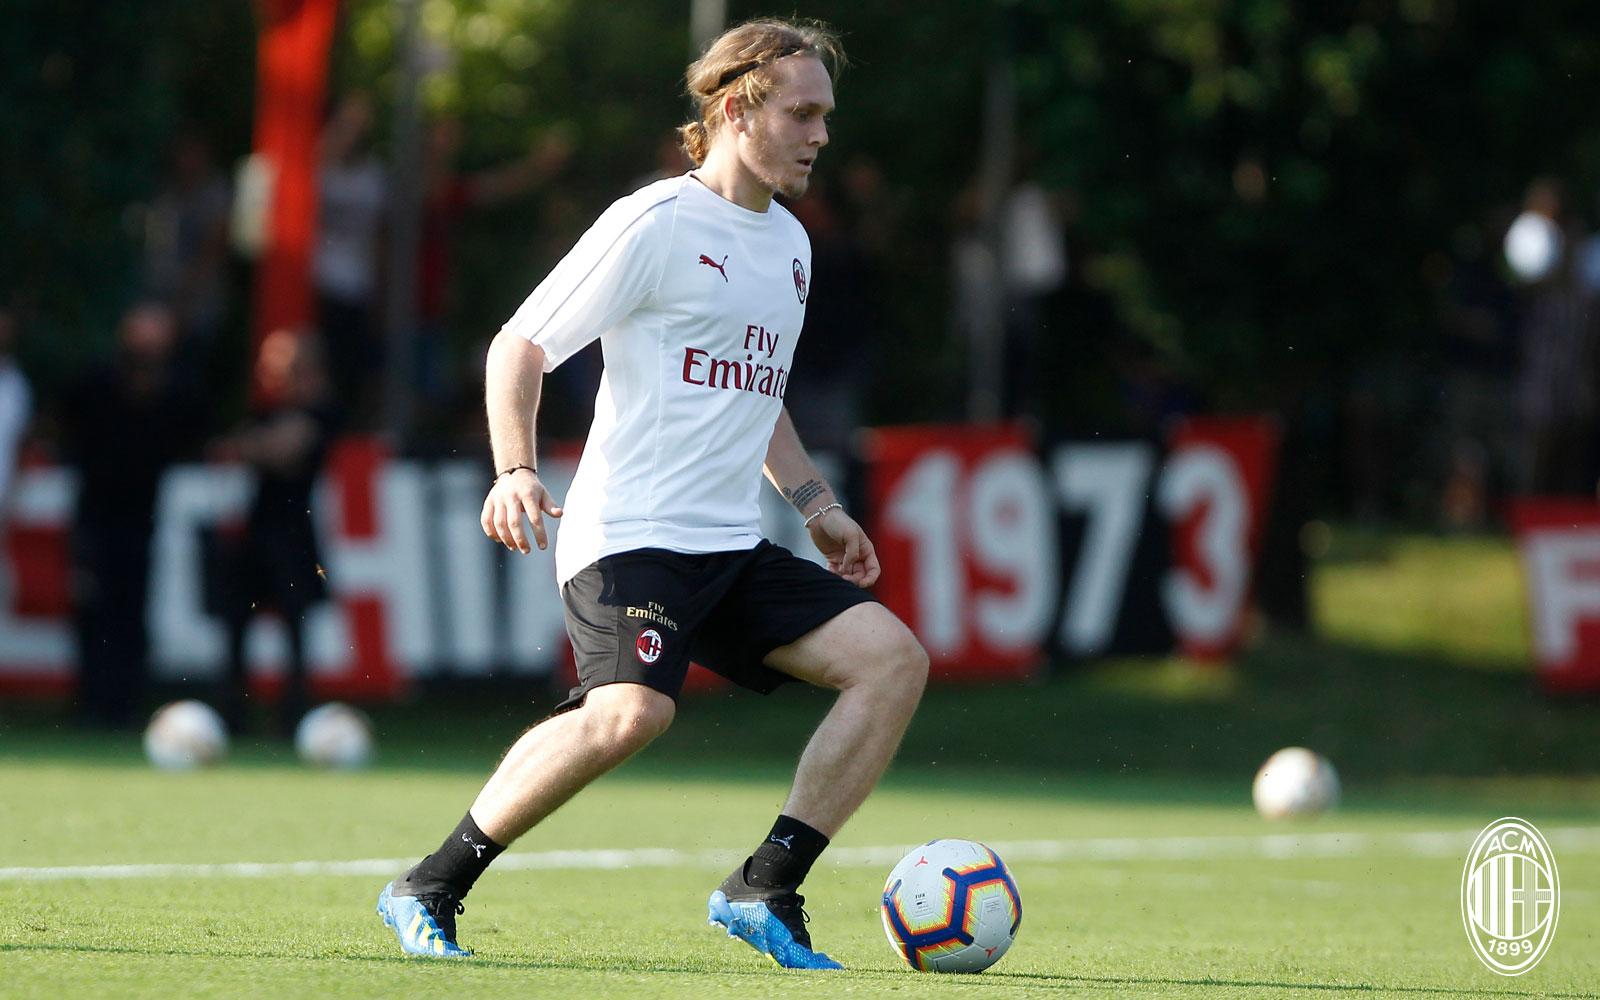 Alen Halilović during training at Milanello. (@acmilan.com)